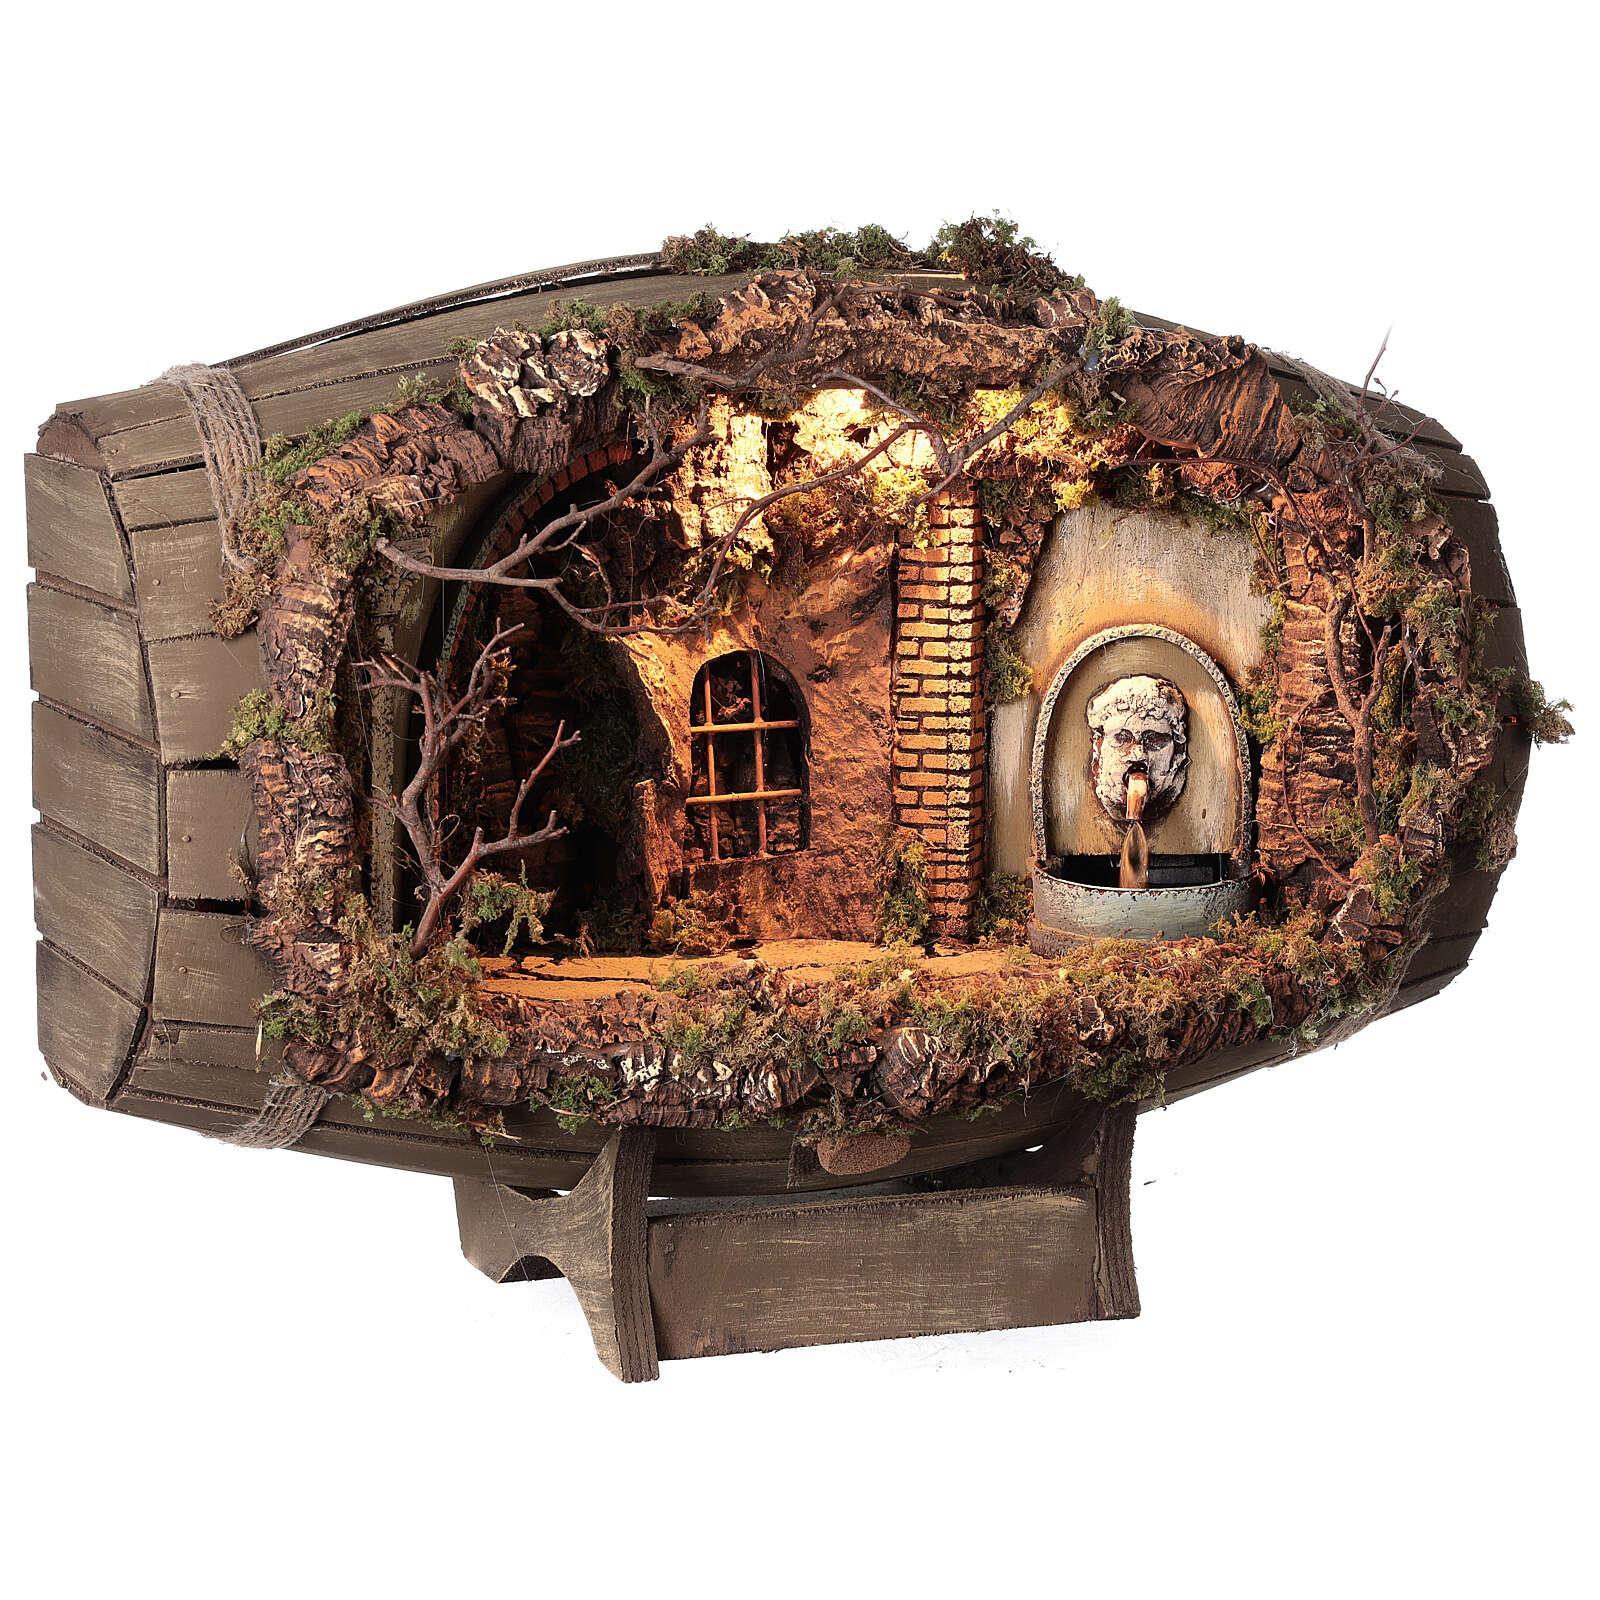 Neapolitan nativity scene horizontal barrel 12-15 cm 4